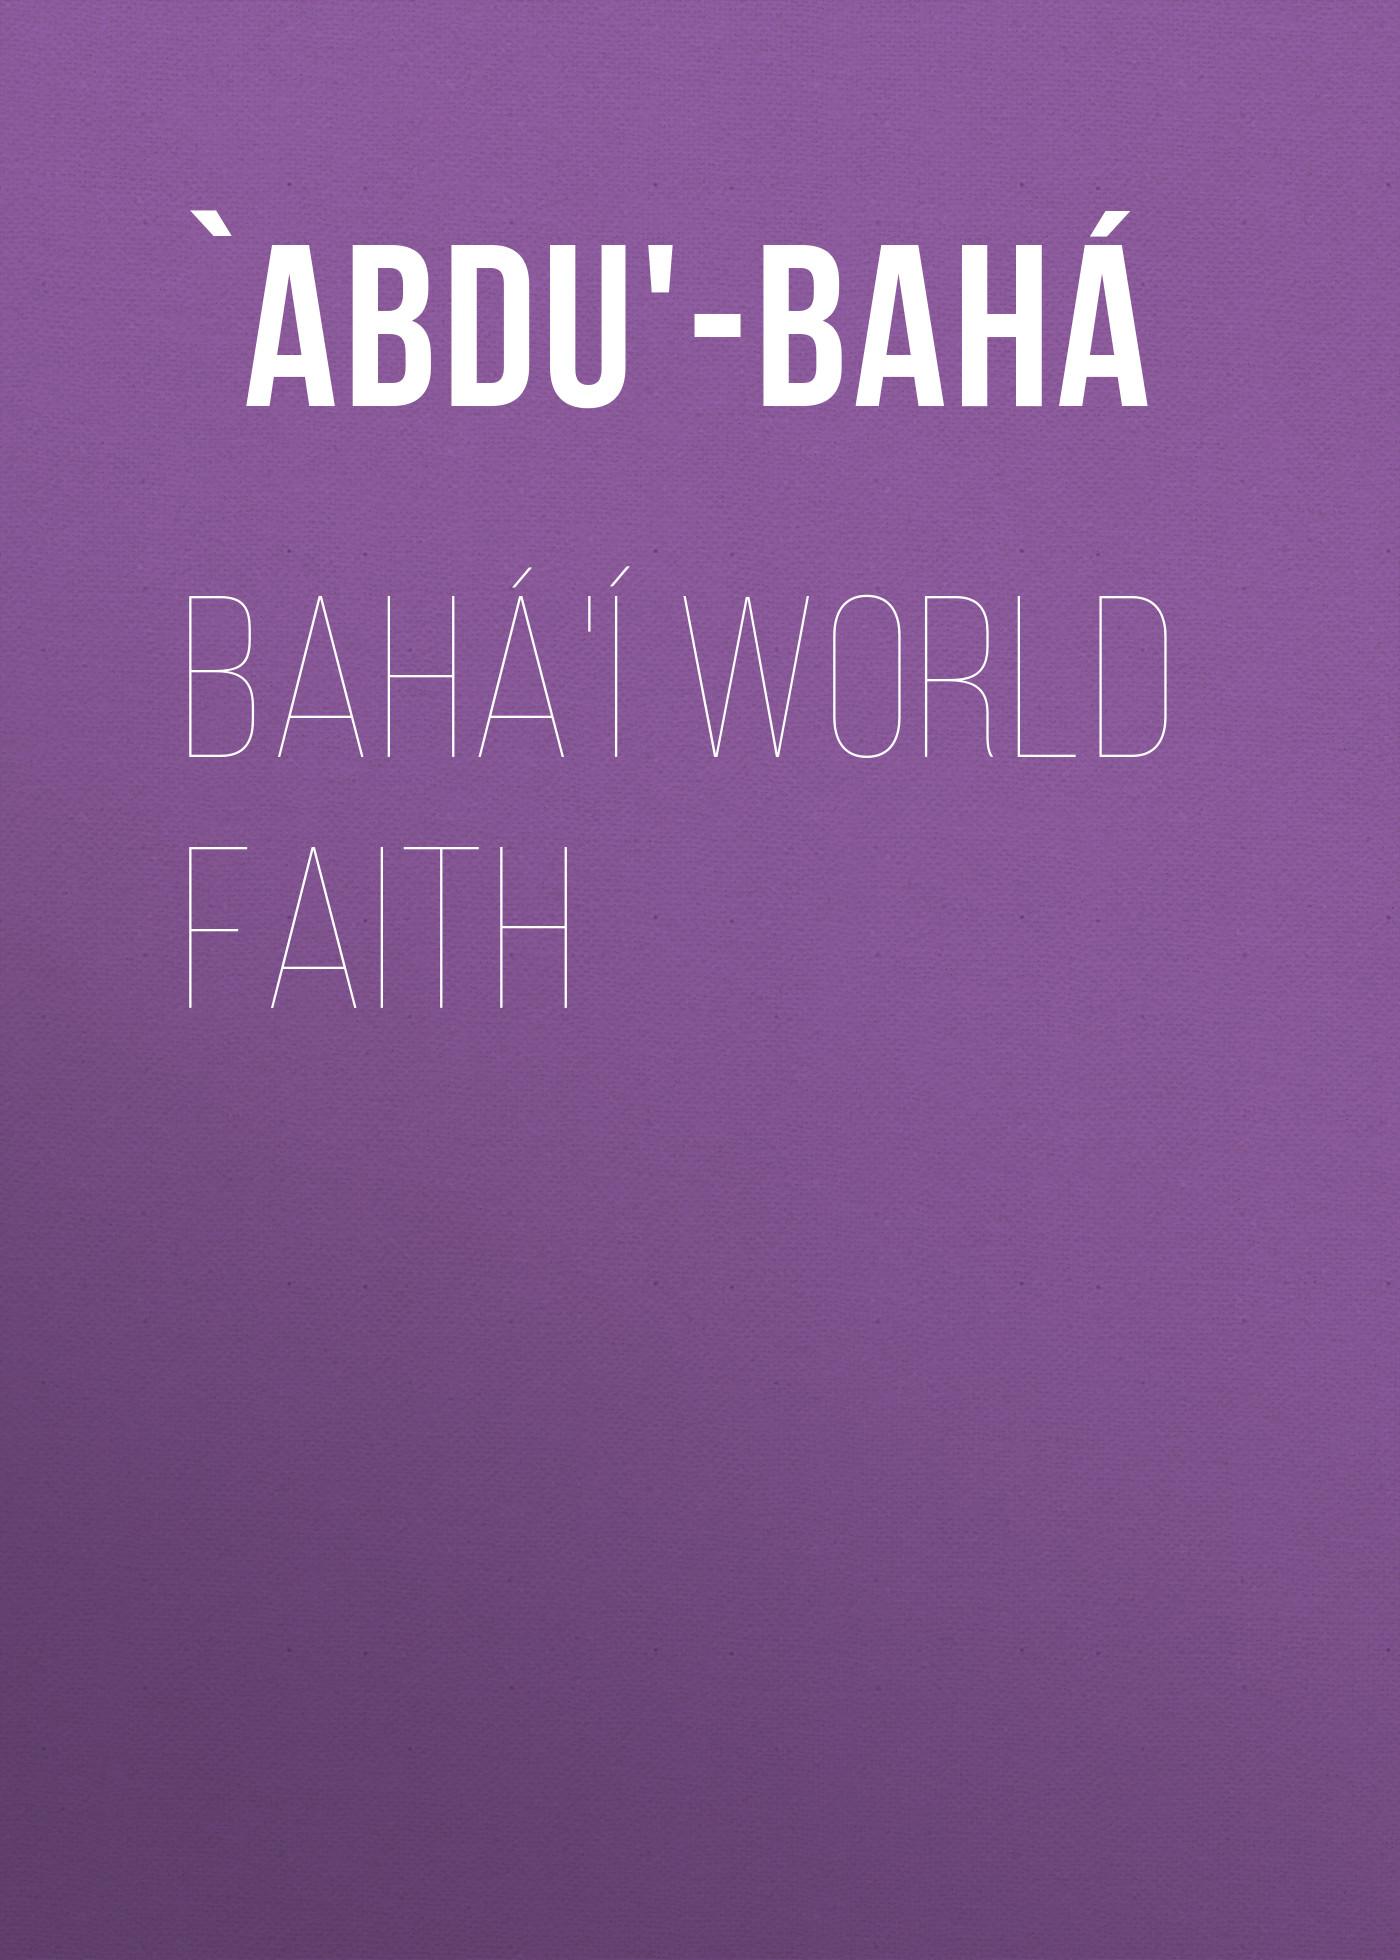 лучшая цена `Abdu'-Bahá Bahá'í World Faith